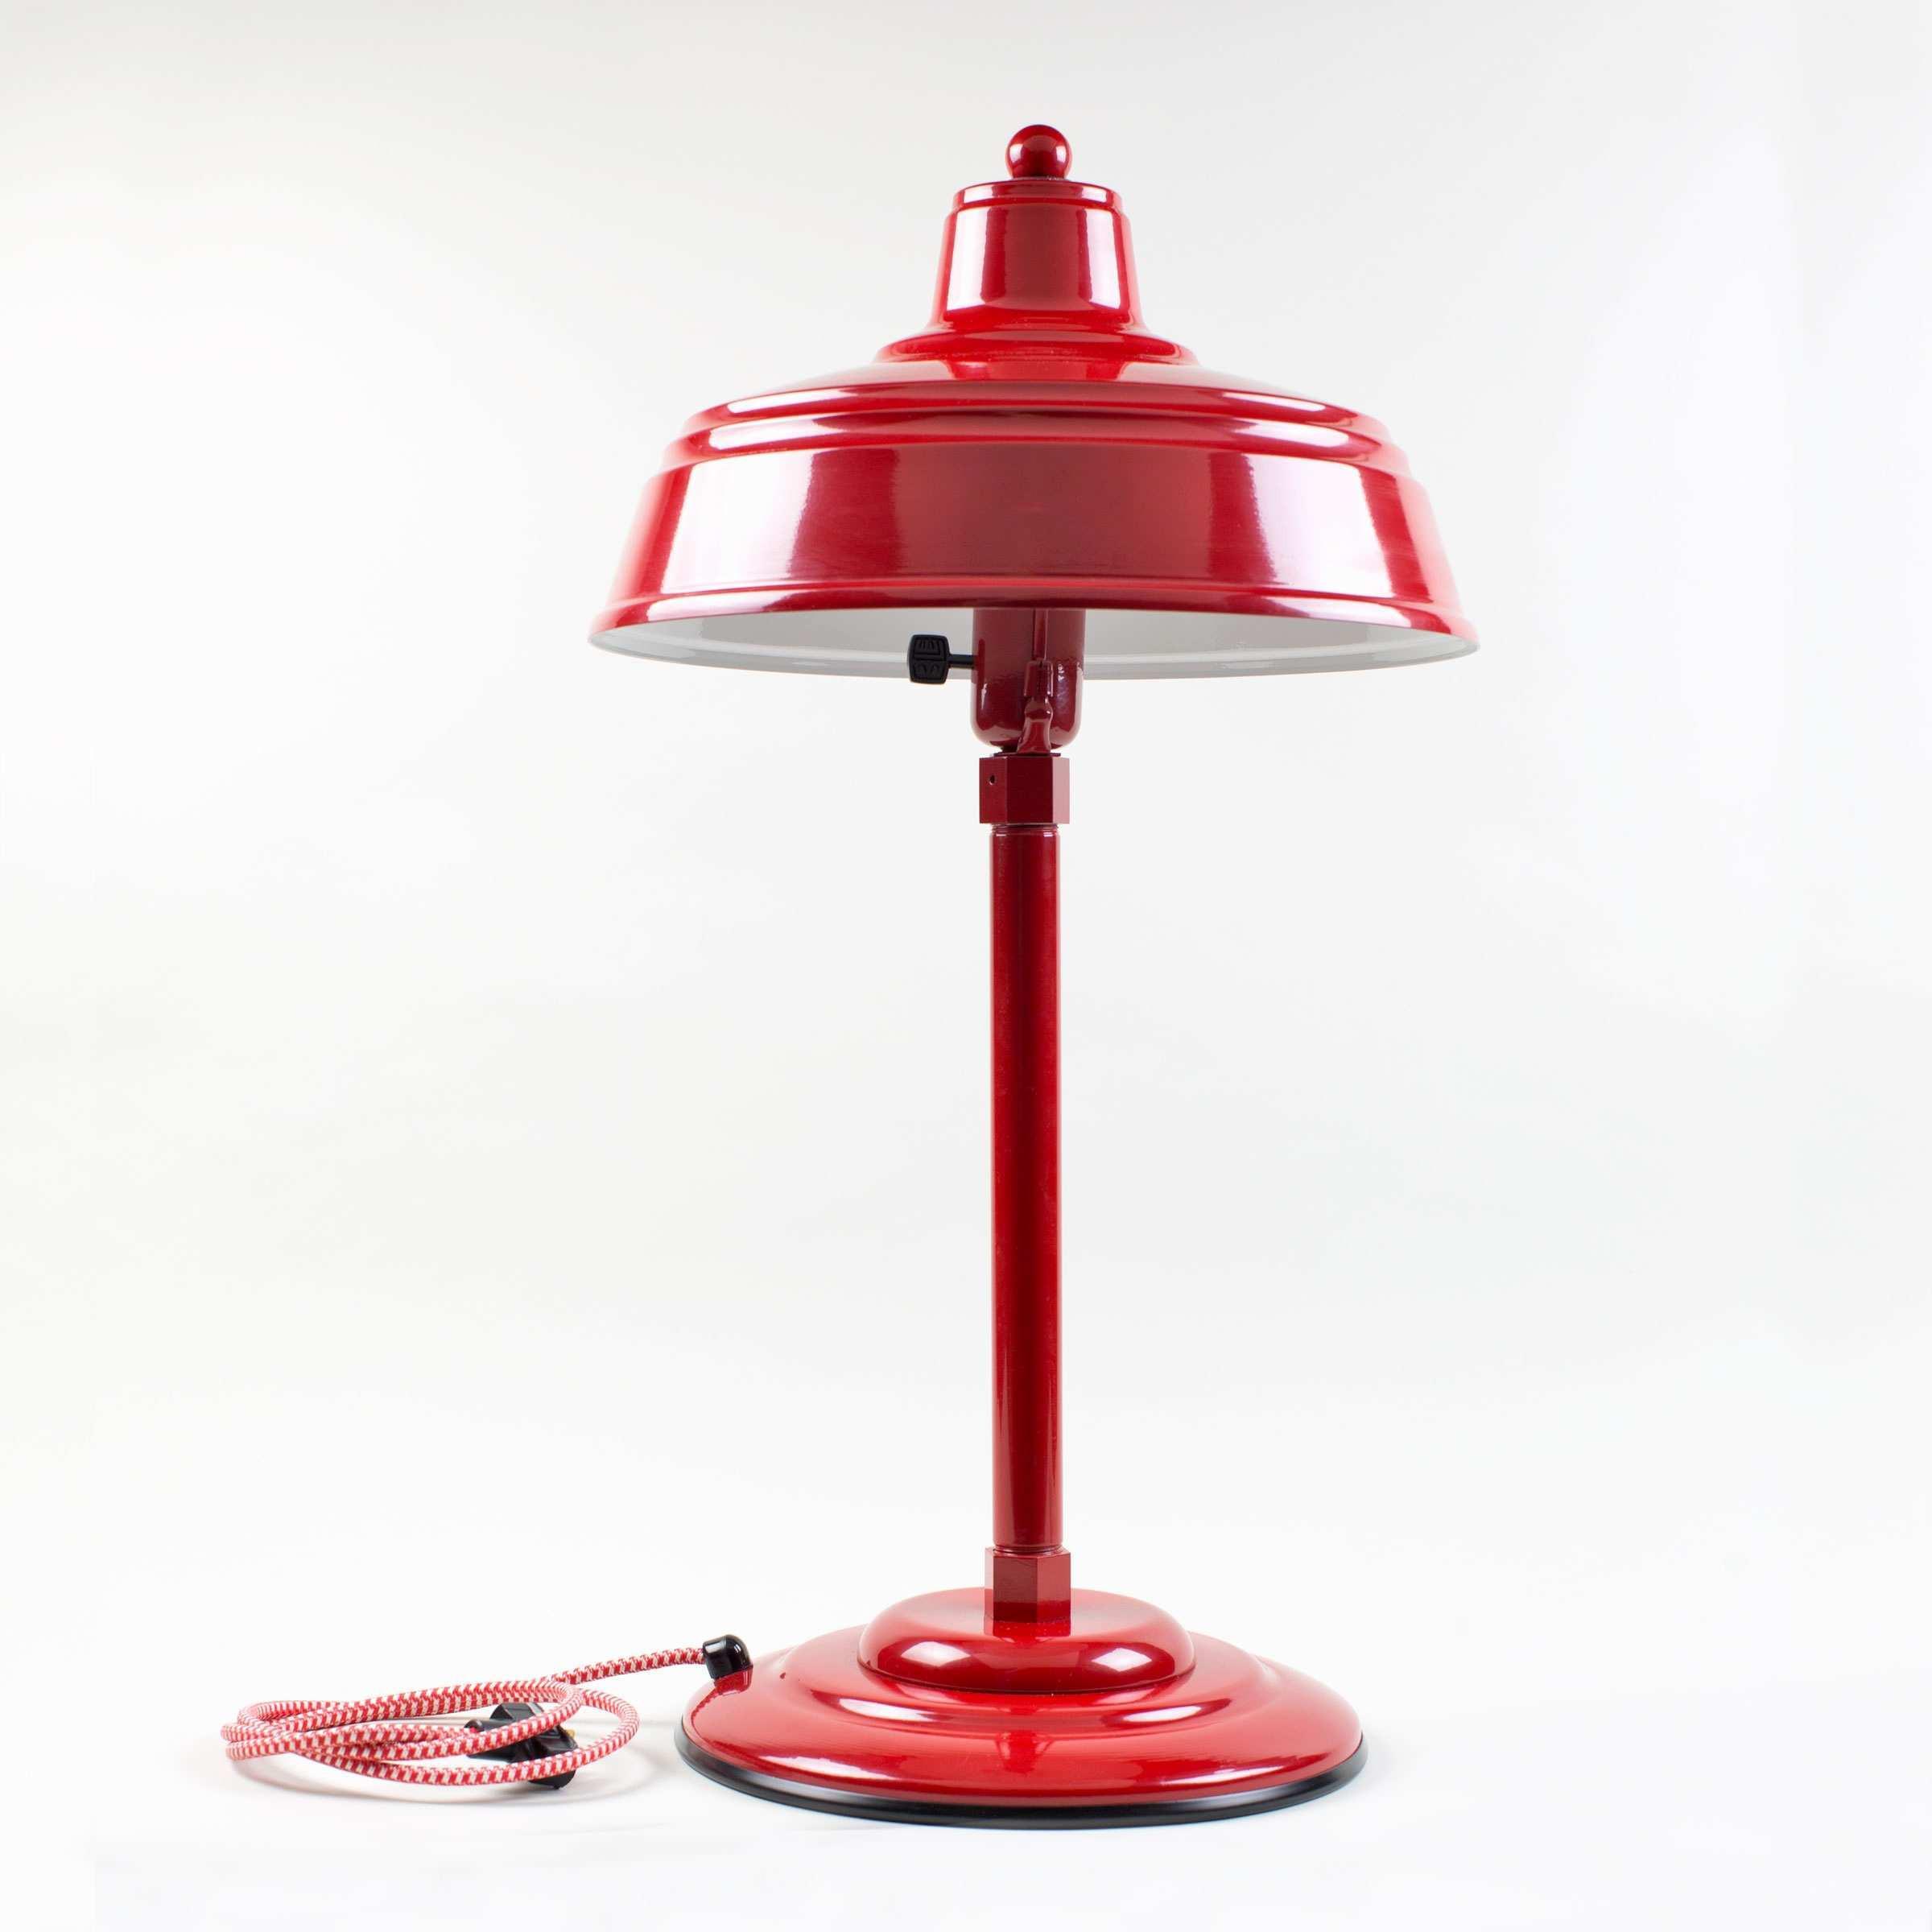 Best ideas about Amazon Desk Lamps . Save or Pin Amazon Floor Lamps Sale Contemporary Retro Desk Lamps Now.